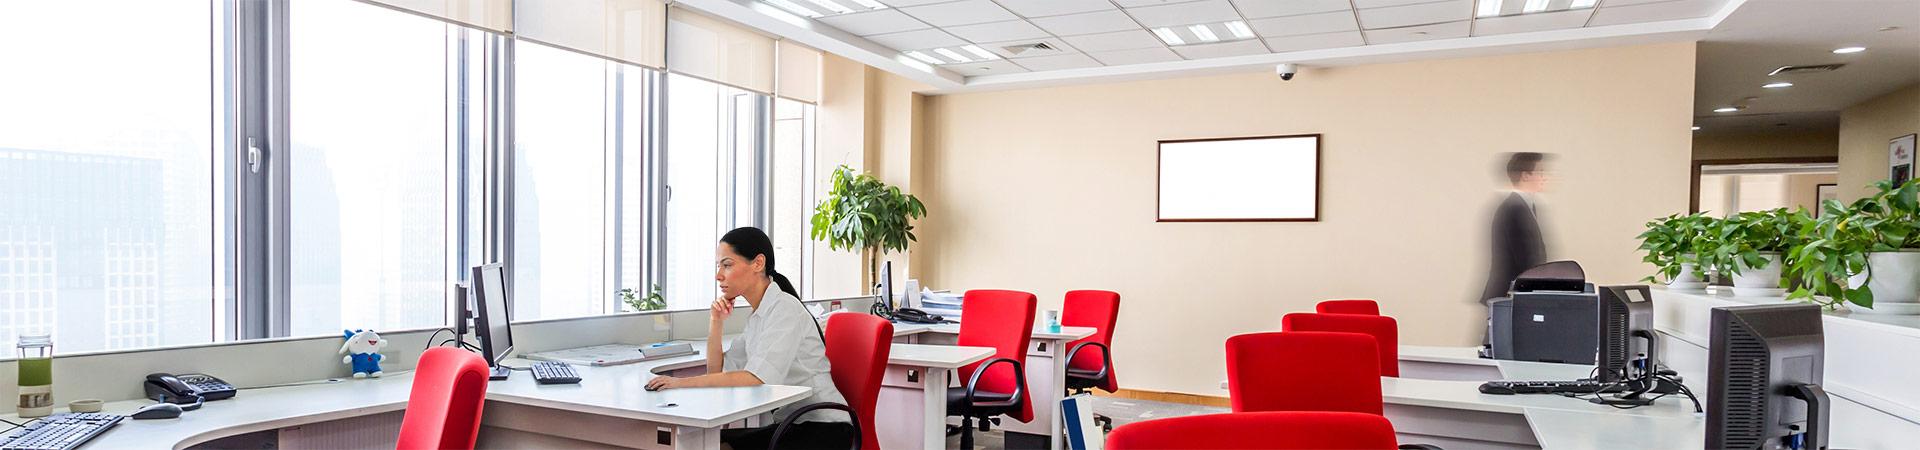 office photograph